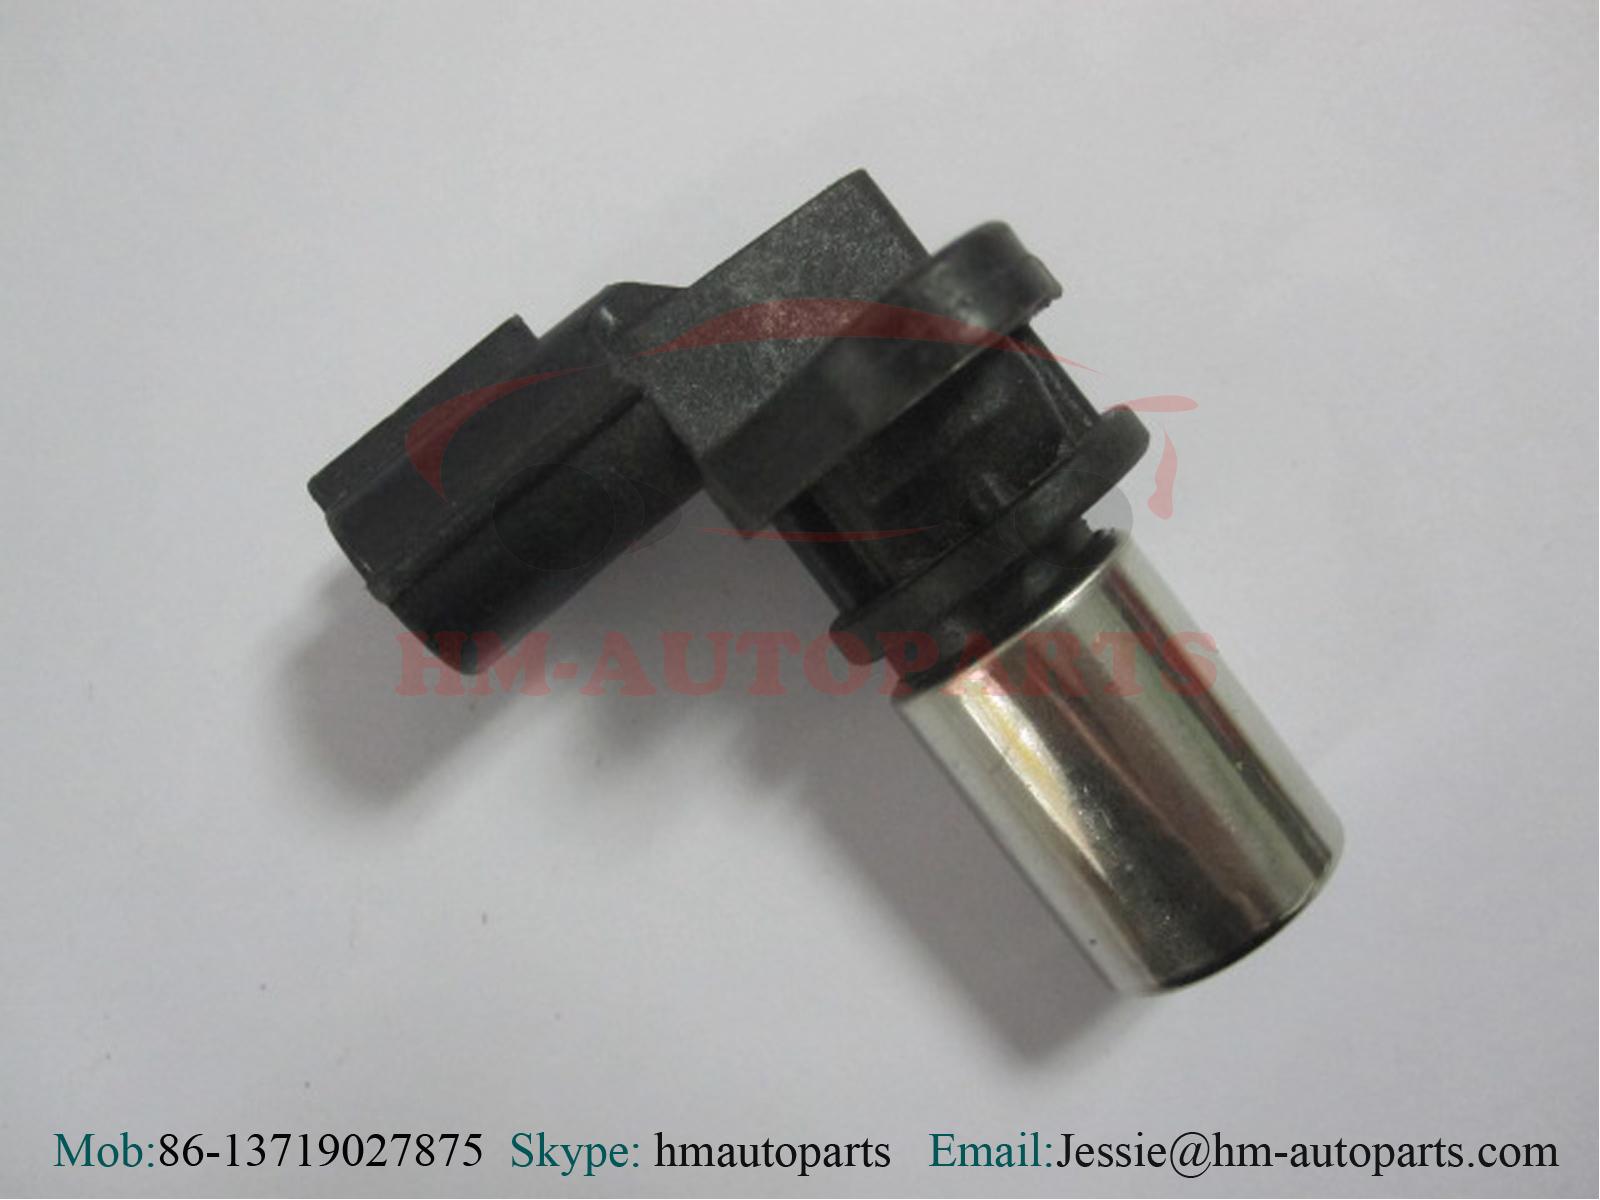 Crankshaft Position Sensor for Toyota Lexus Scion Pontiac 2.4L 90919-05047